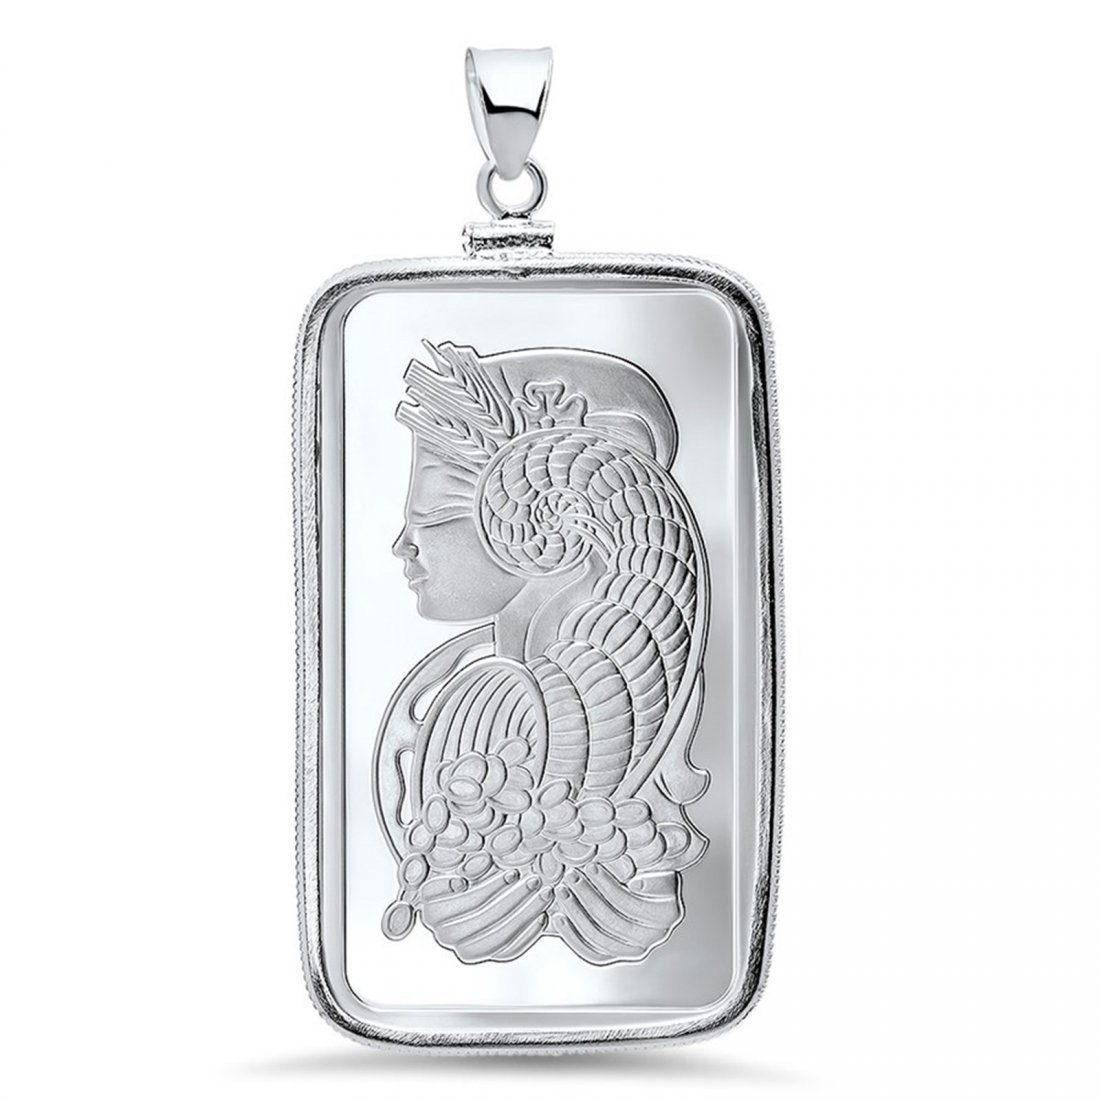 1 oz Silver Bar - Pamp Suisse Pendant (Fortuna)